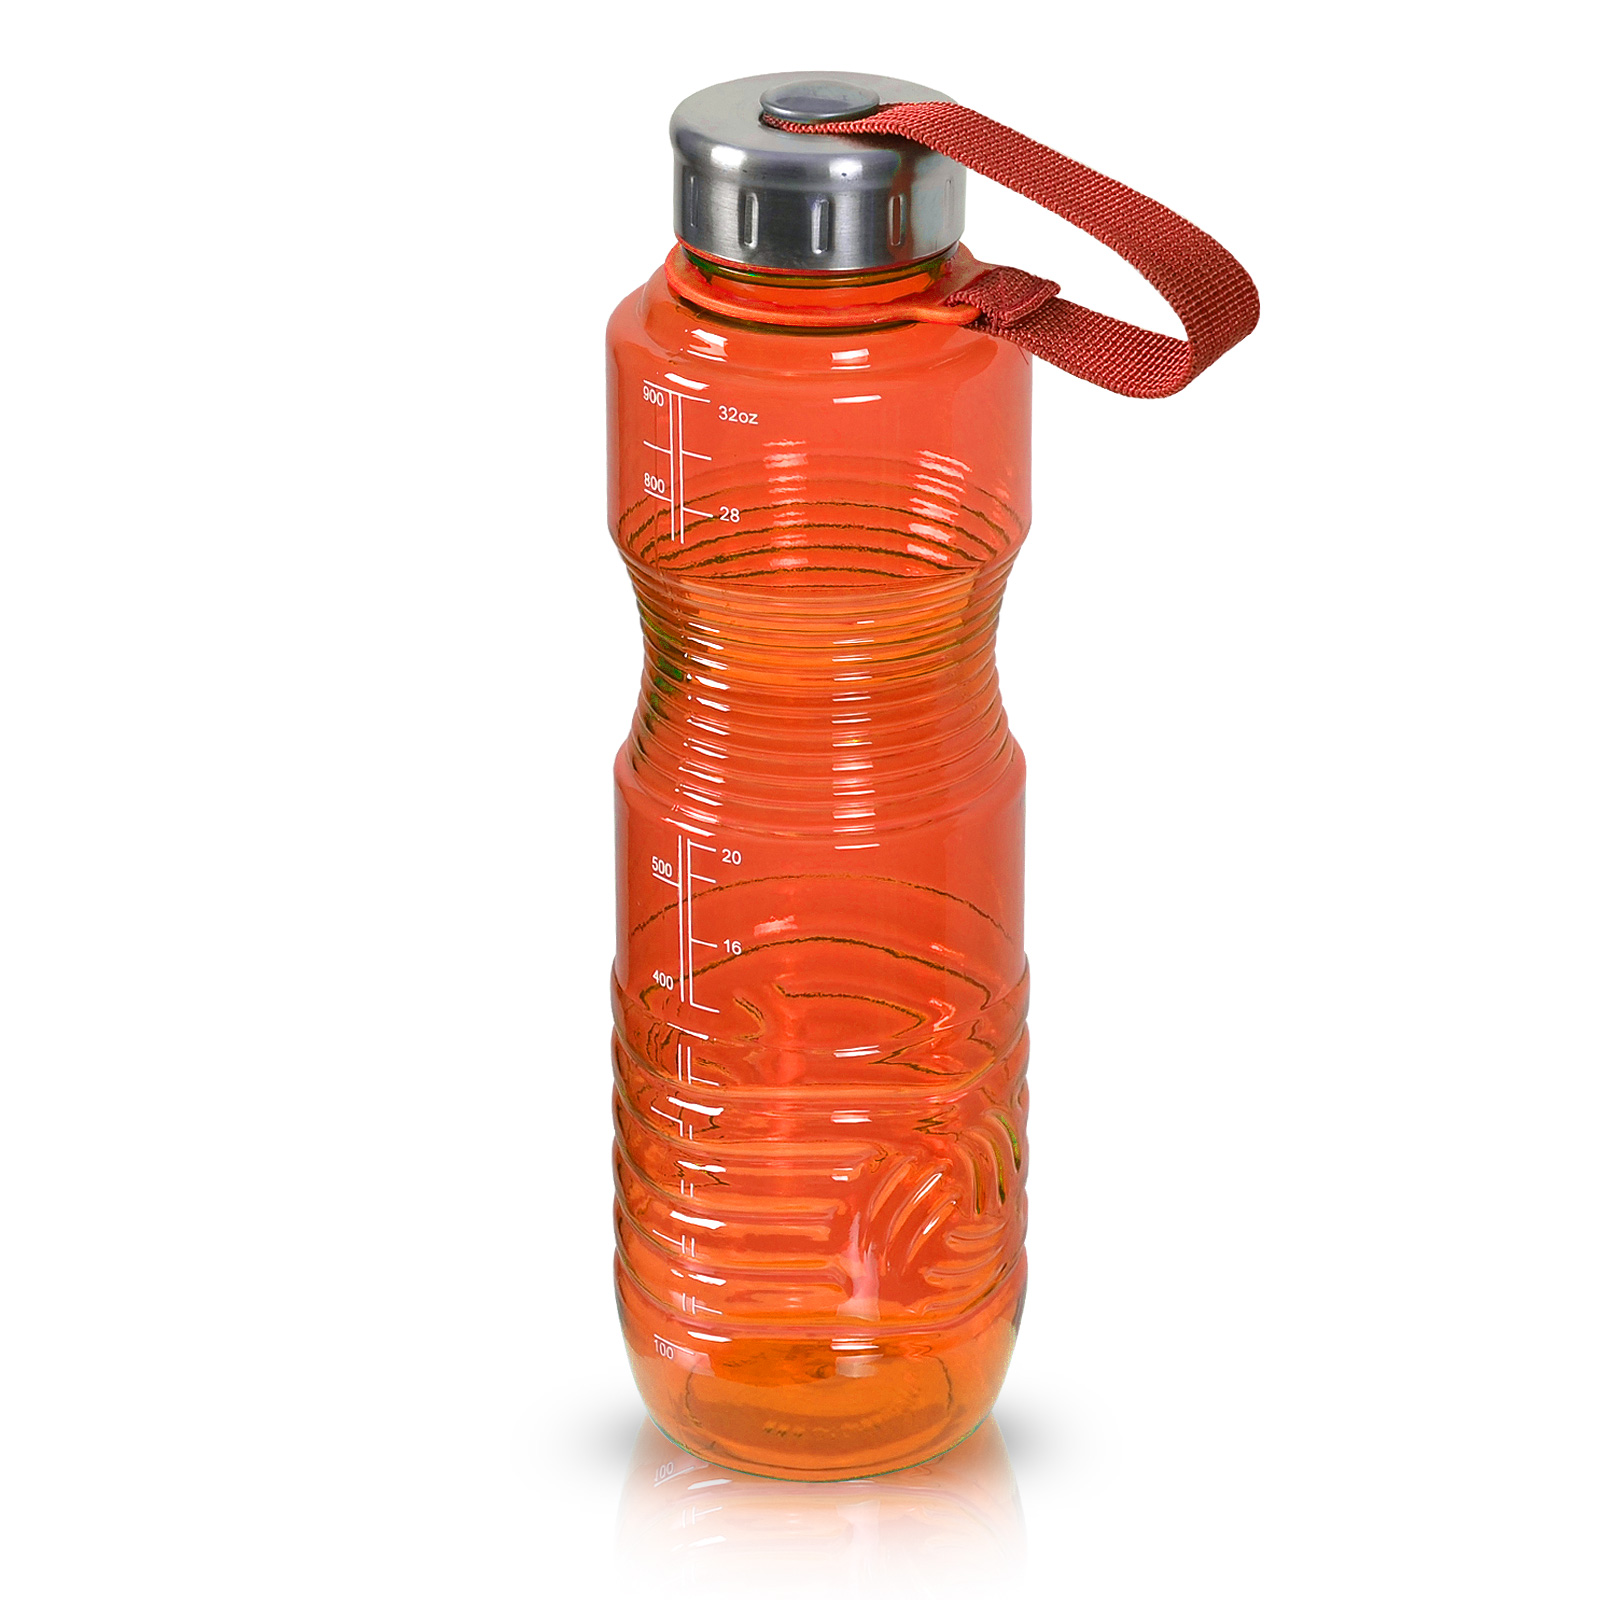 32oz BPA FREE Reusable Plastic Sport Water Bottle Jug Container